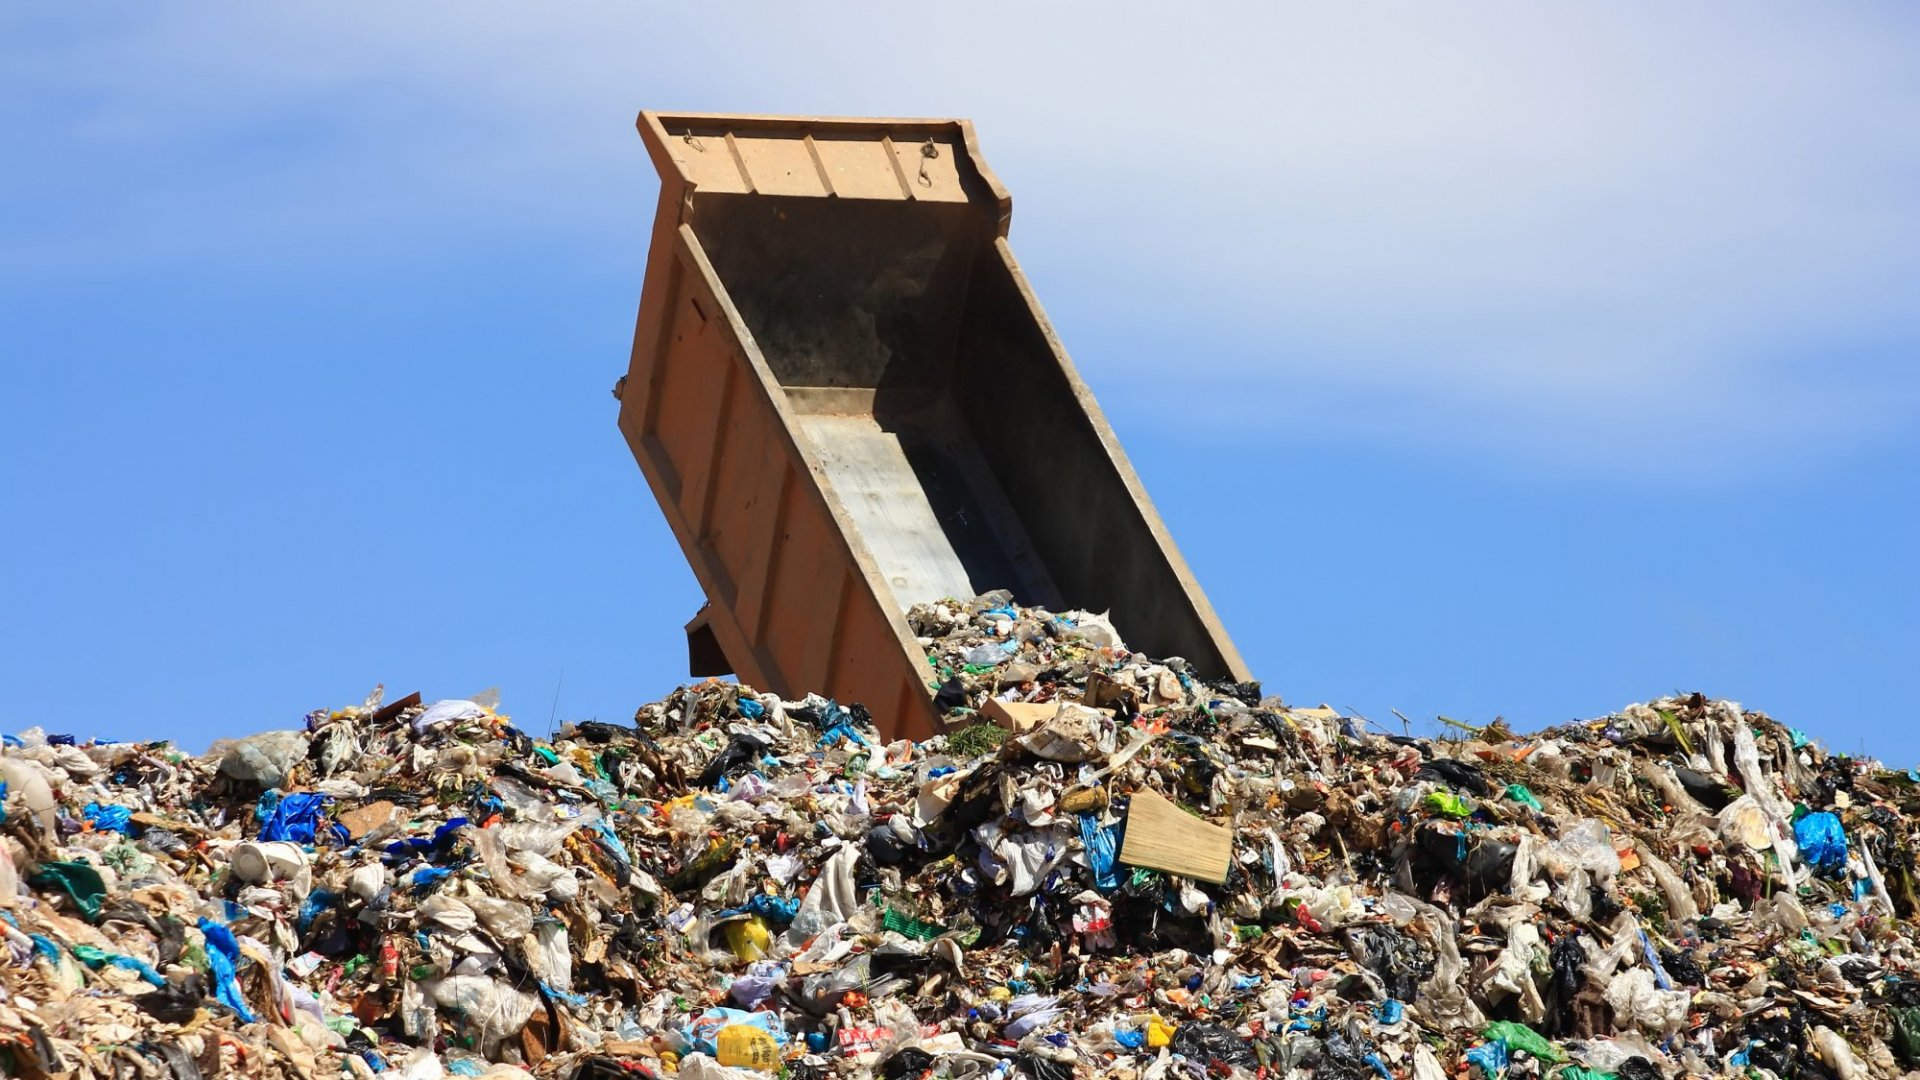 4 Innovative Businesses Turning Trash Into Cash